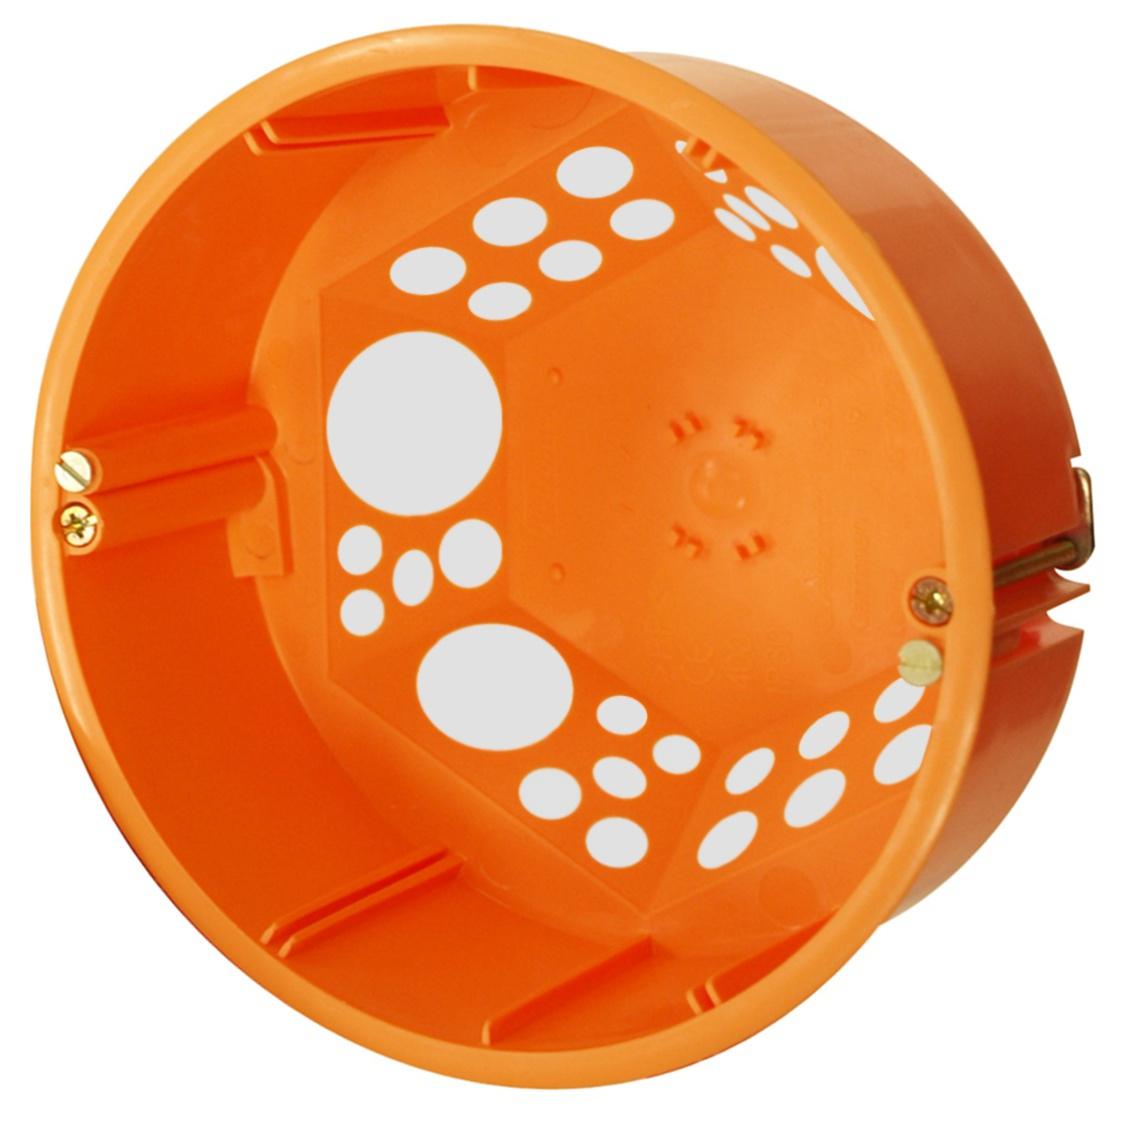 100 Stk Hohlwandabzweigdose winddicht Ø 120 mm, orange, M20/25 GTDWE816--